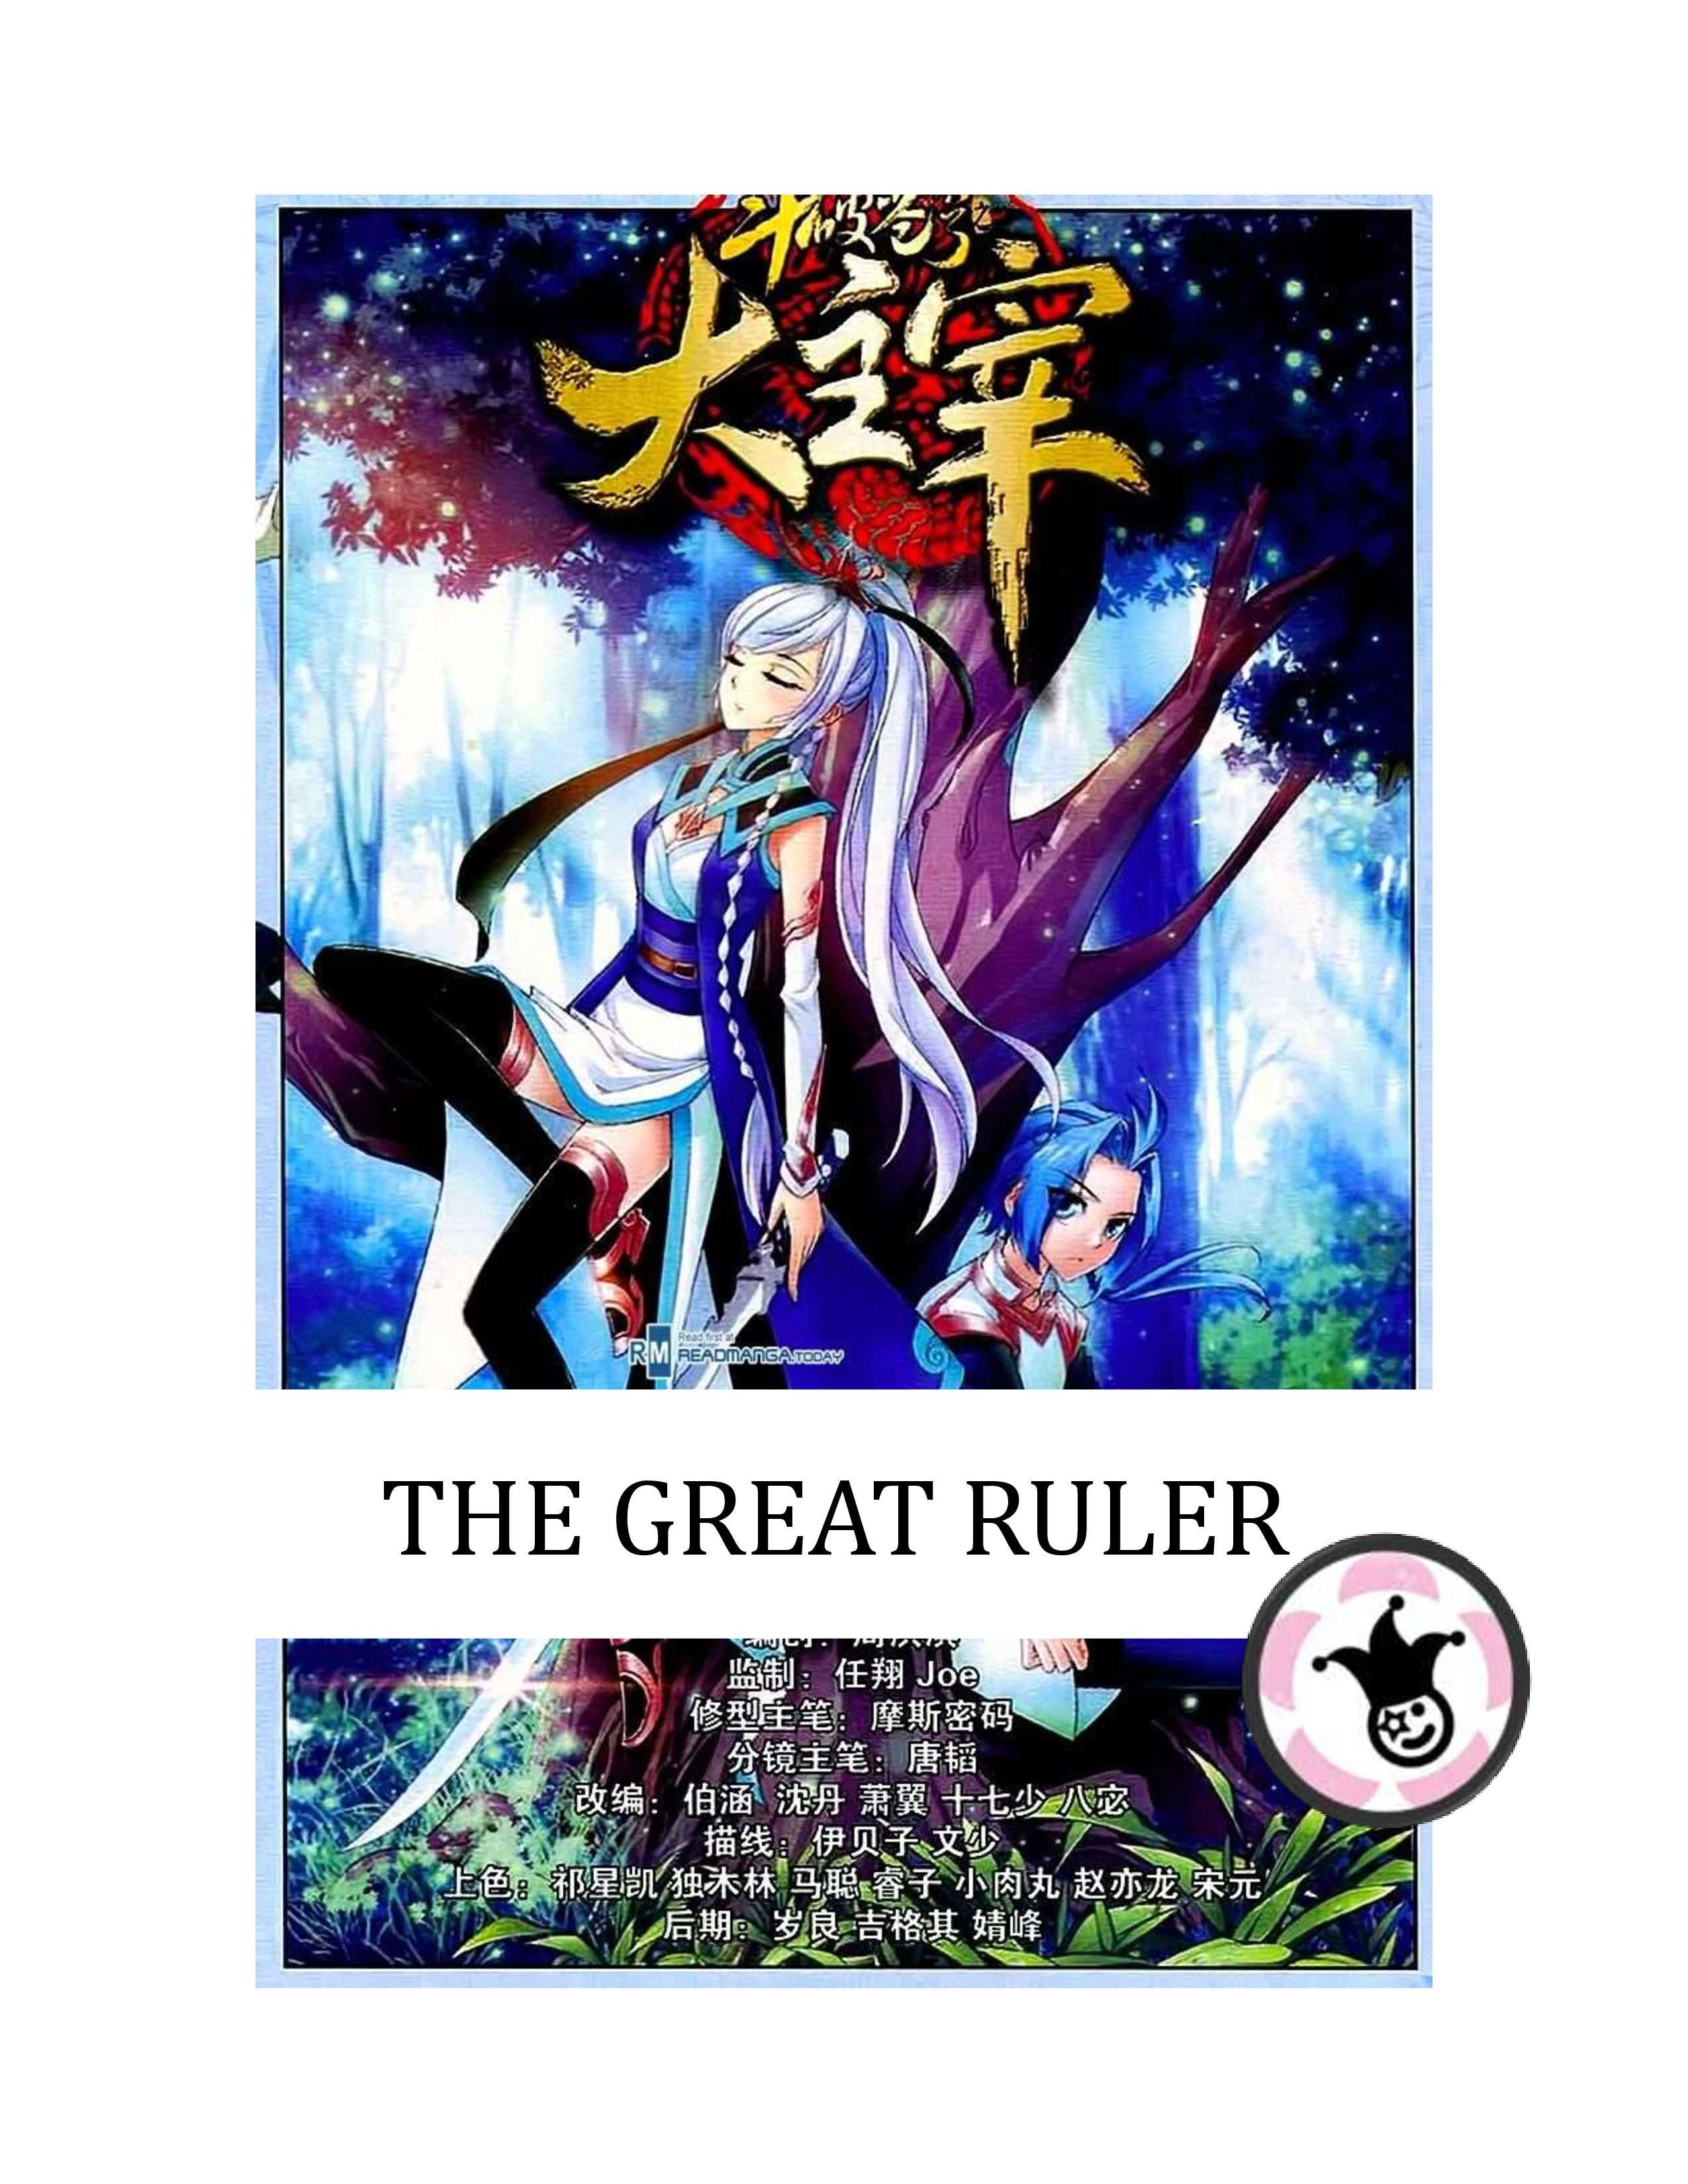 https://c5.mangatag.com/es_manga/pic2/14/20238/488969/2f4c72bb471810da1d171470c85dd487.jpg Page 1